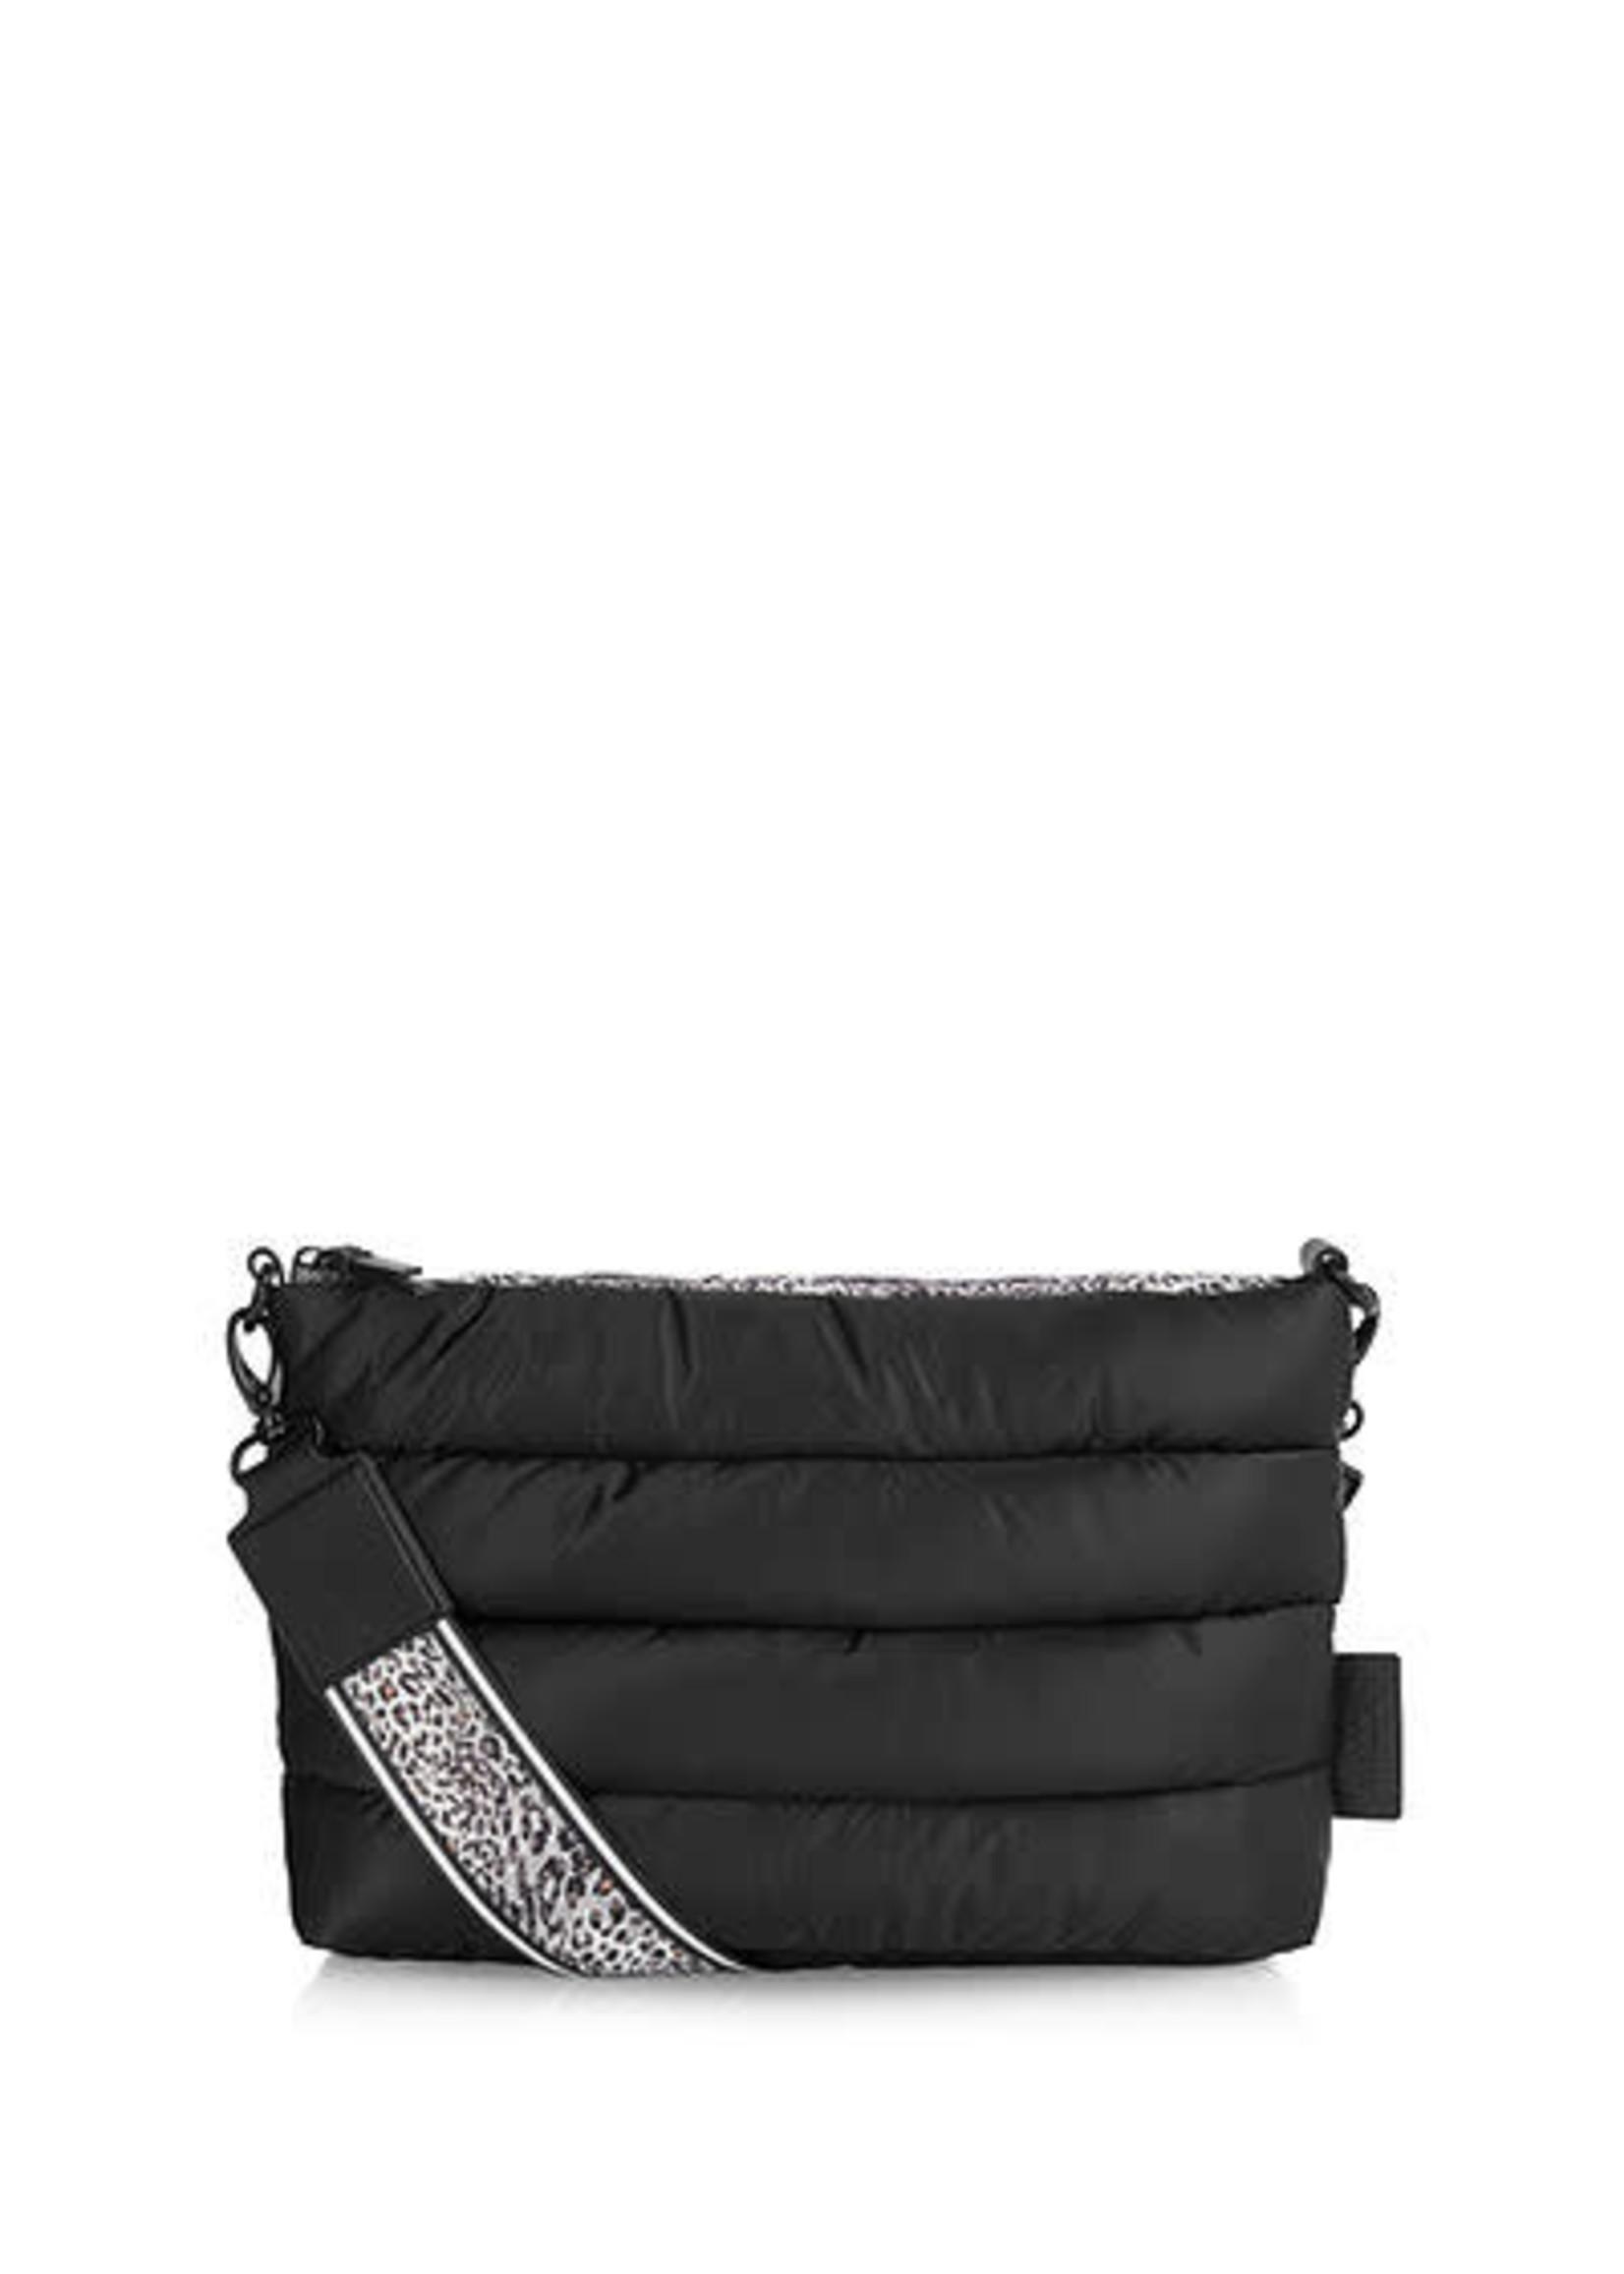 Marccain Bags & Shoes Shopper RB TI.13 W17 black